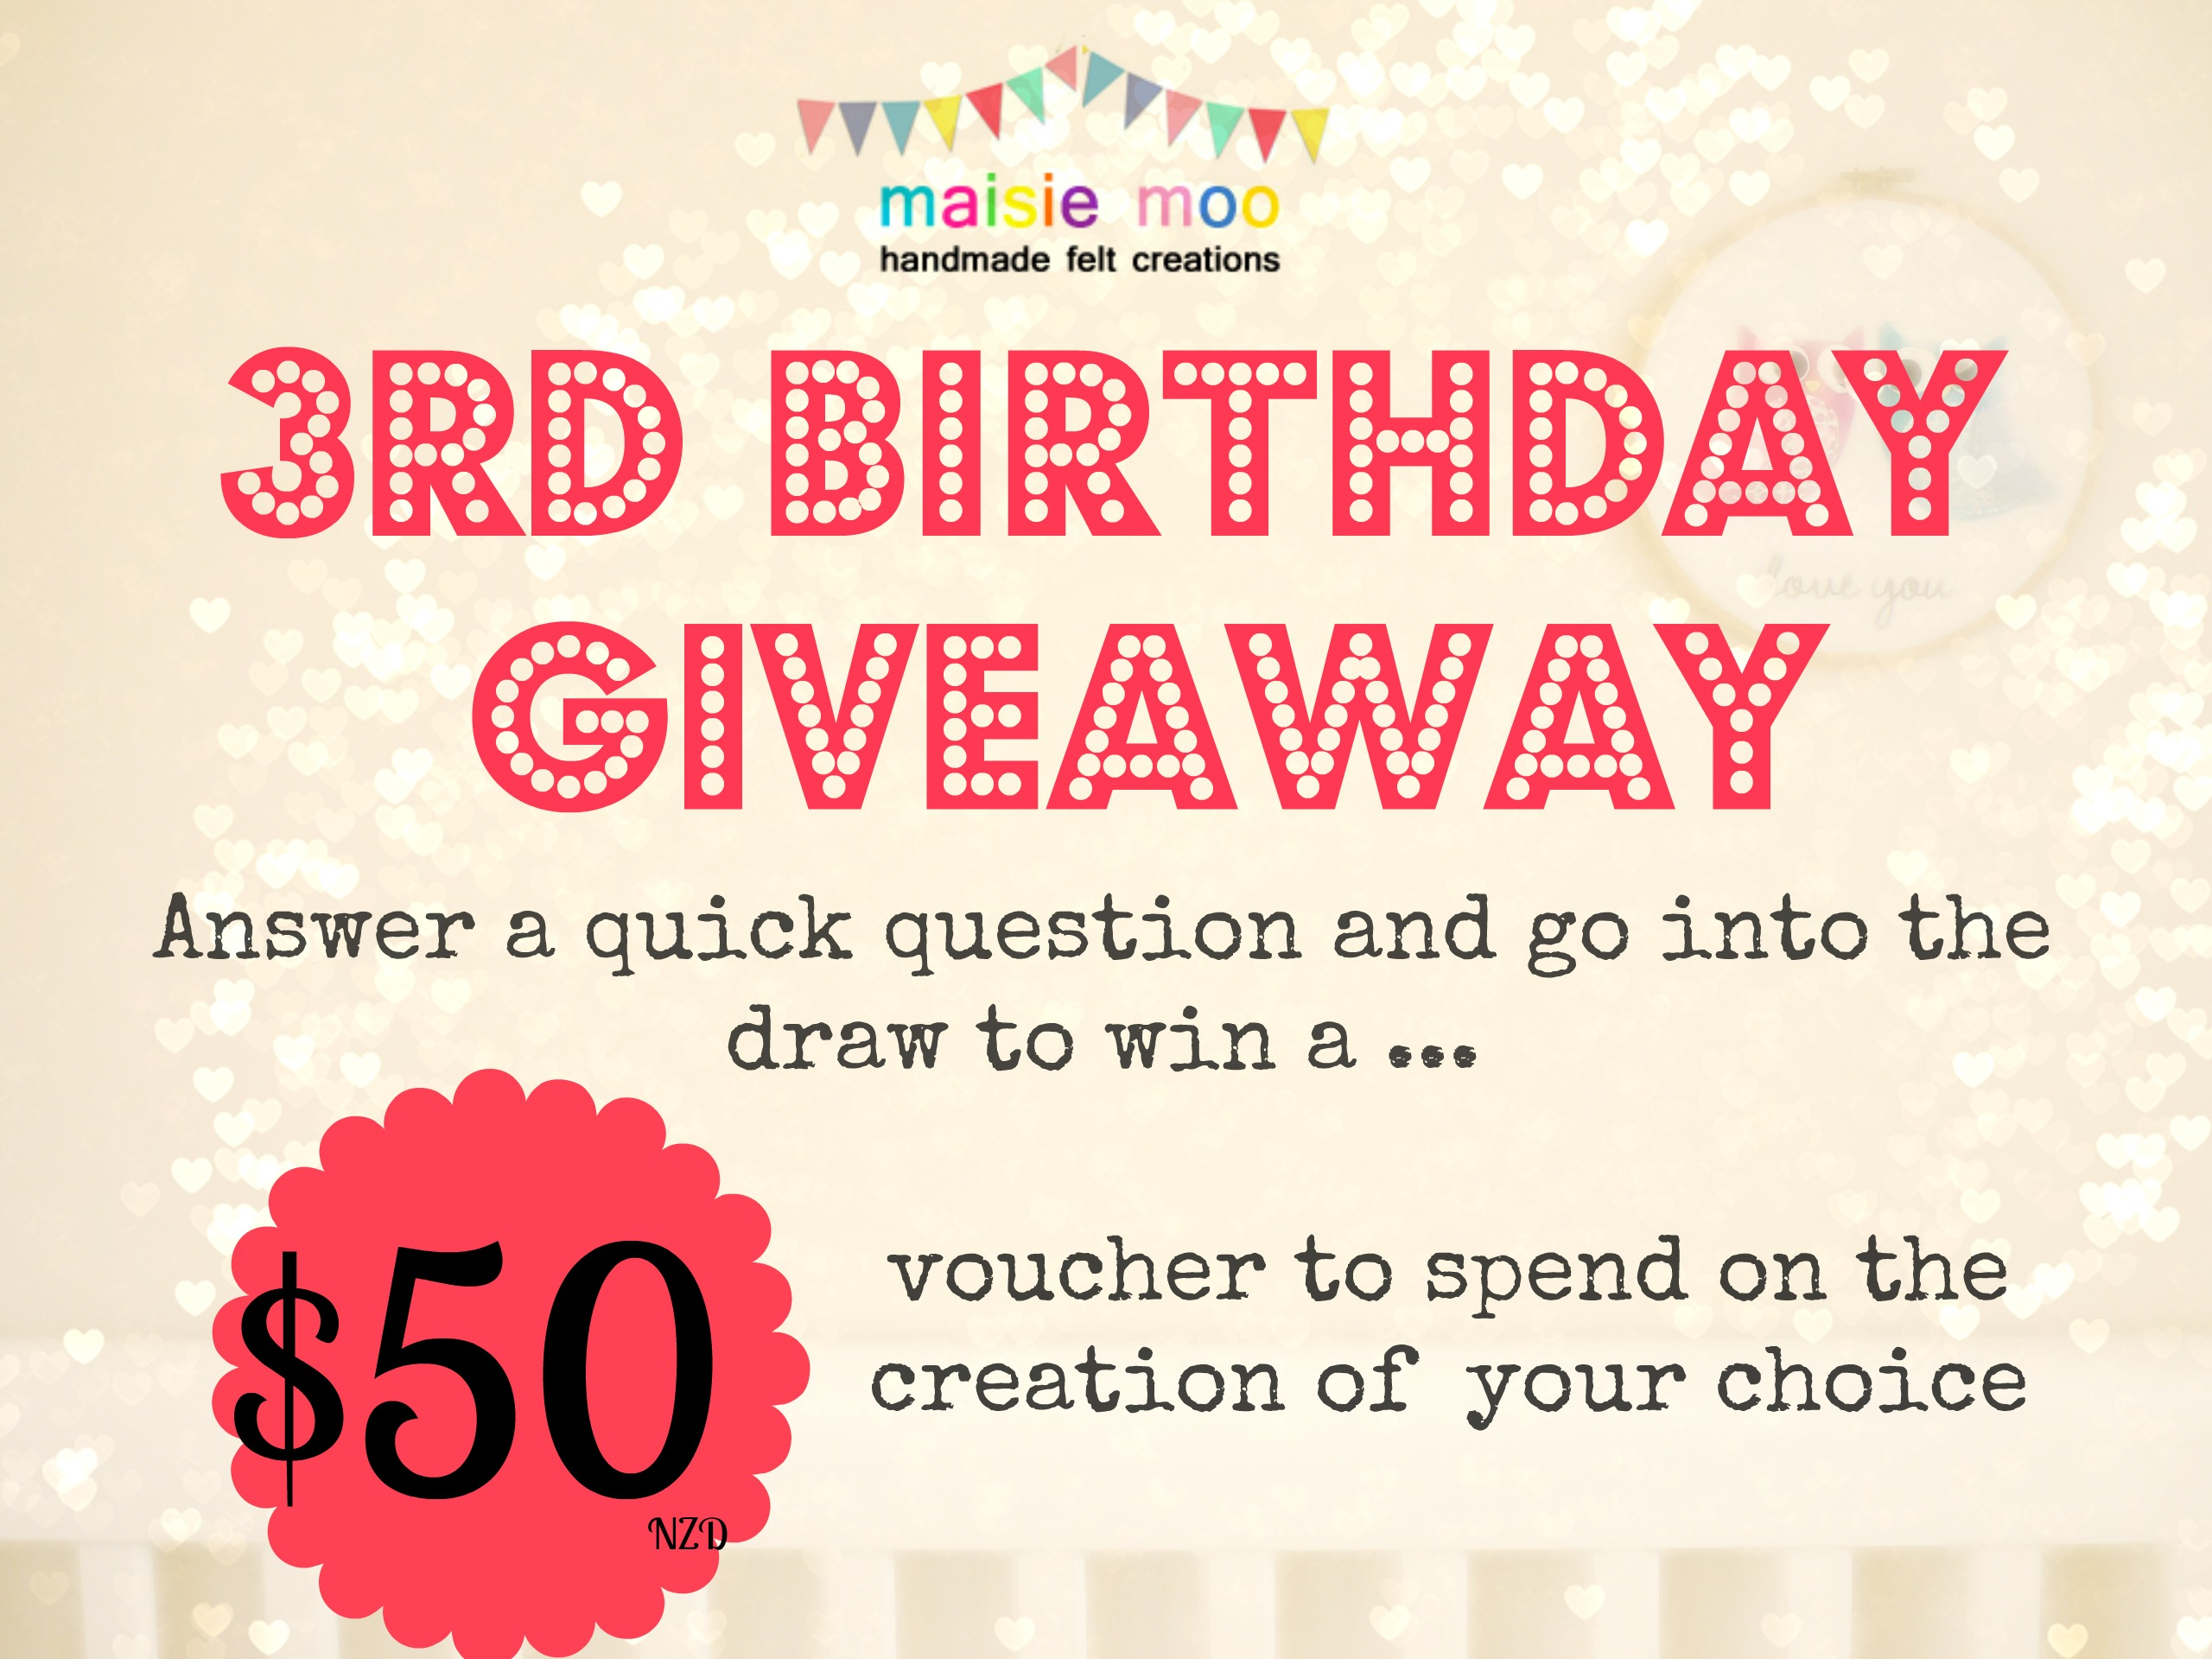 Win $50 voucher for Maisie Moo Felt Creations